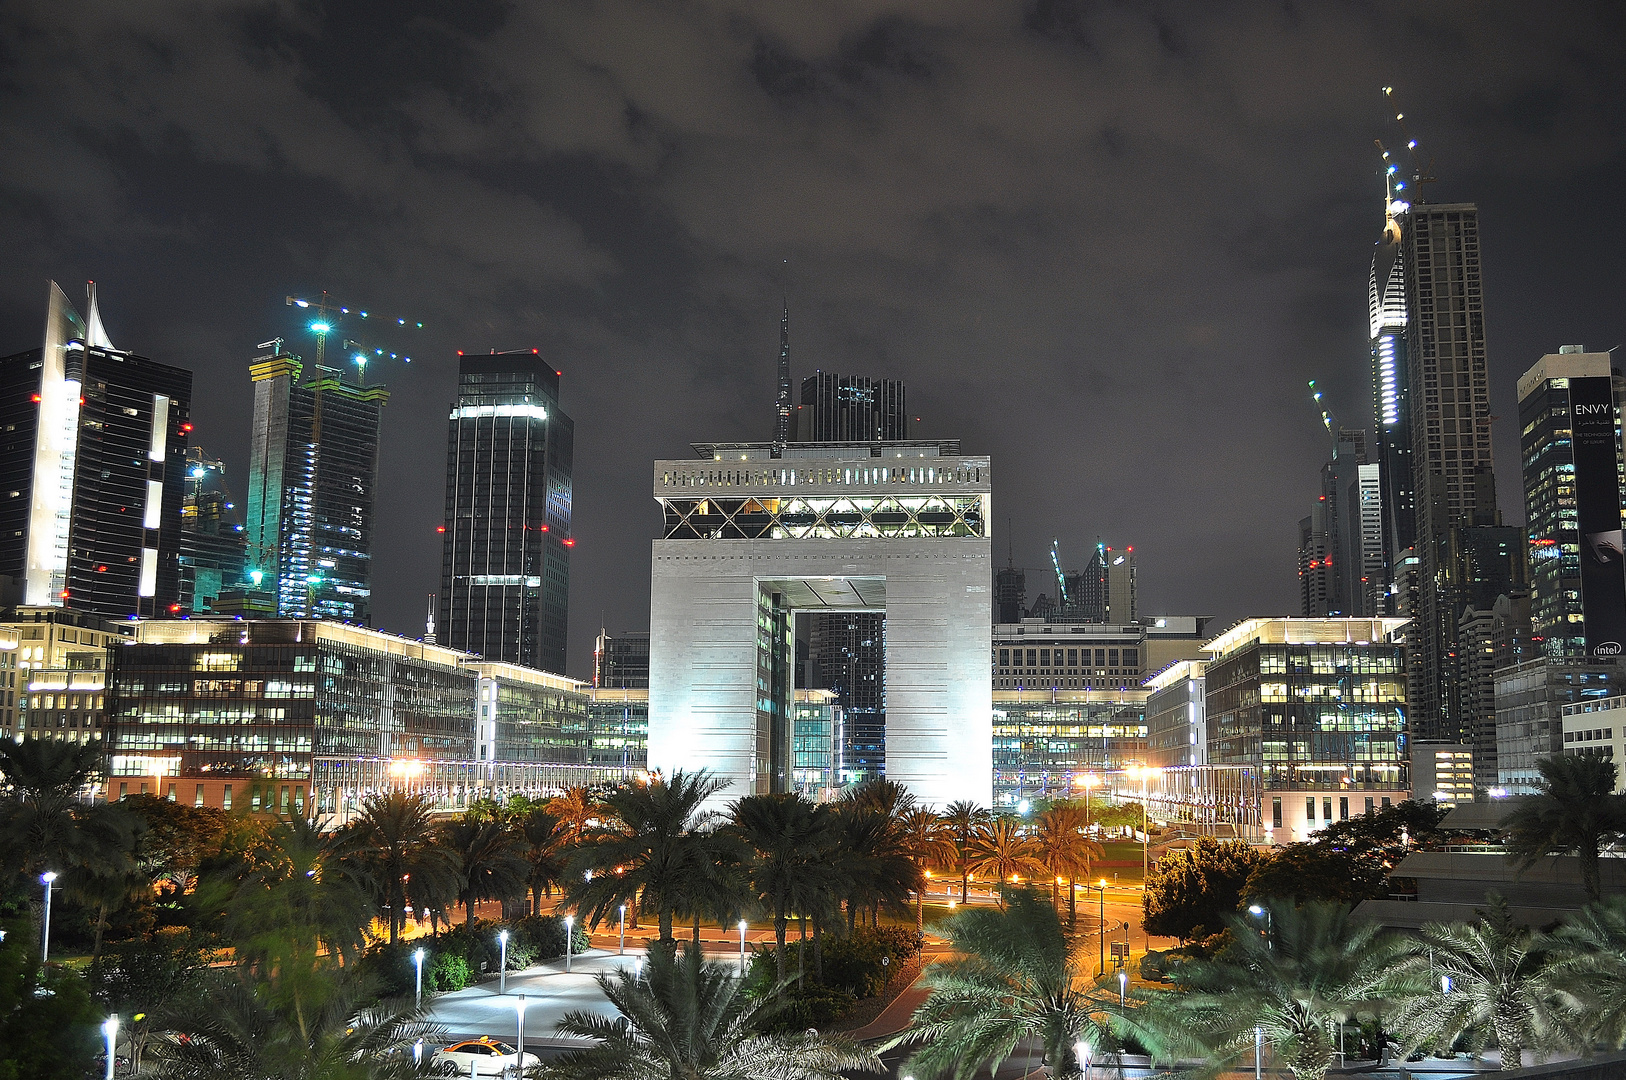 Financial Center Dubai - Sheikh Zayed Road